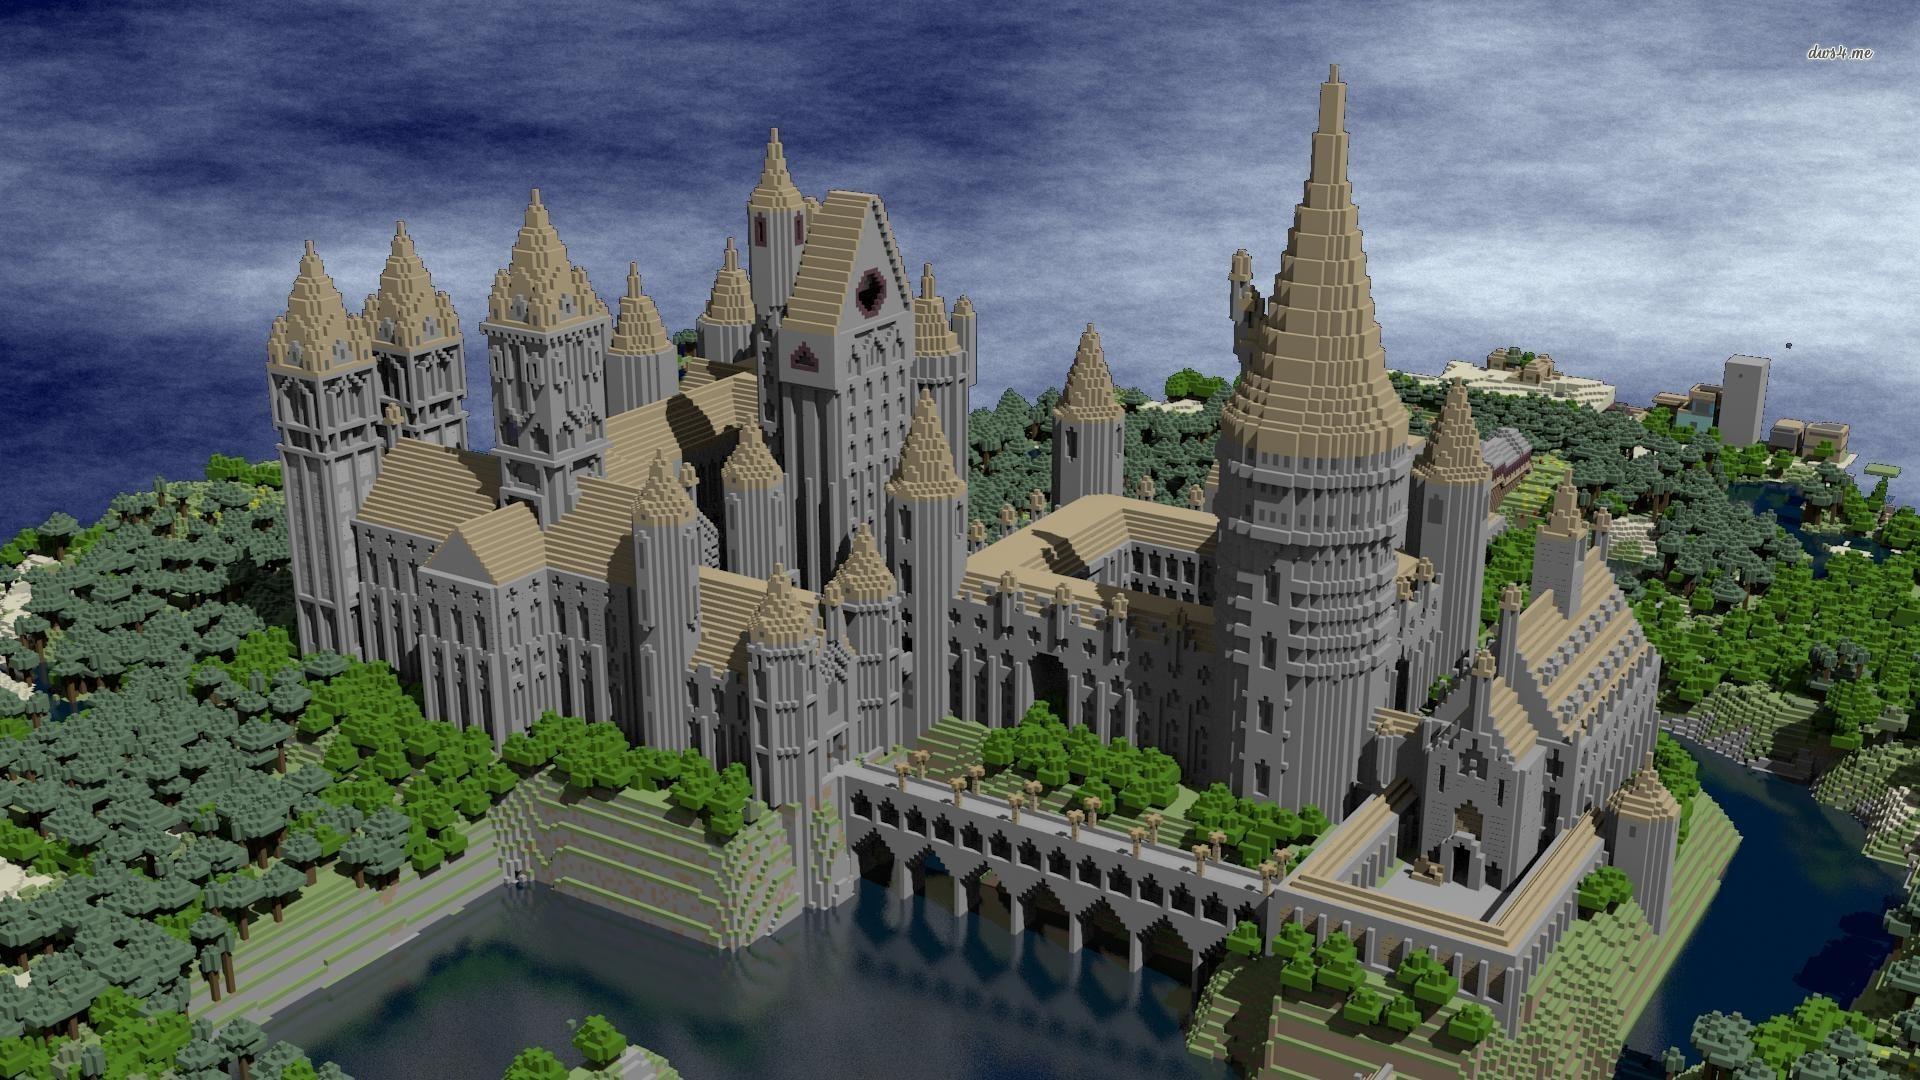 Hogwarts castle – Minecraft Game HD desktop wallpaper, Minecraft wallpaper  – Games no.